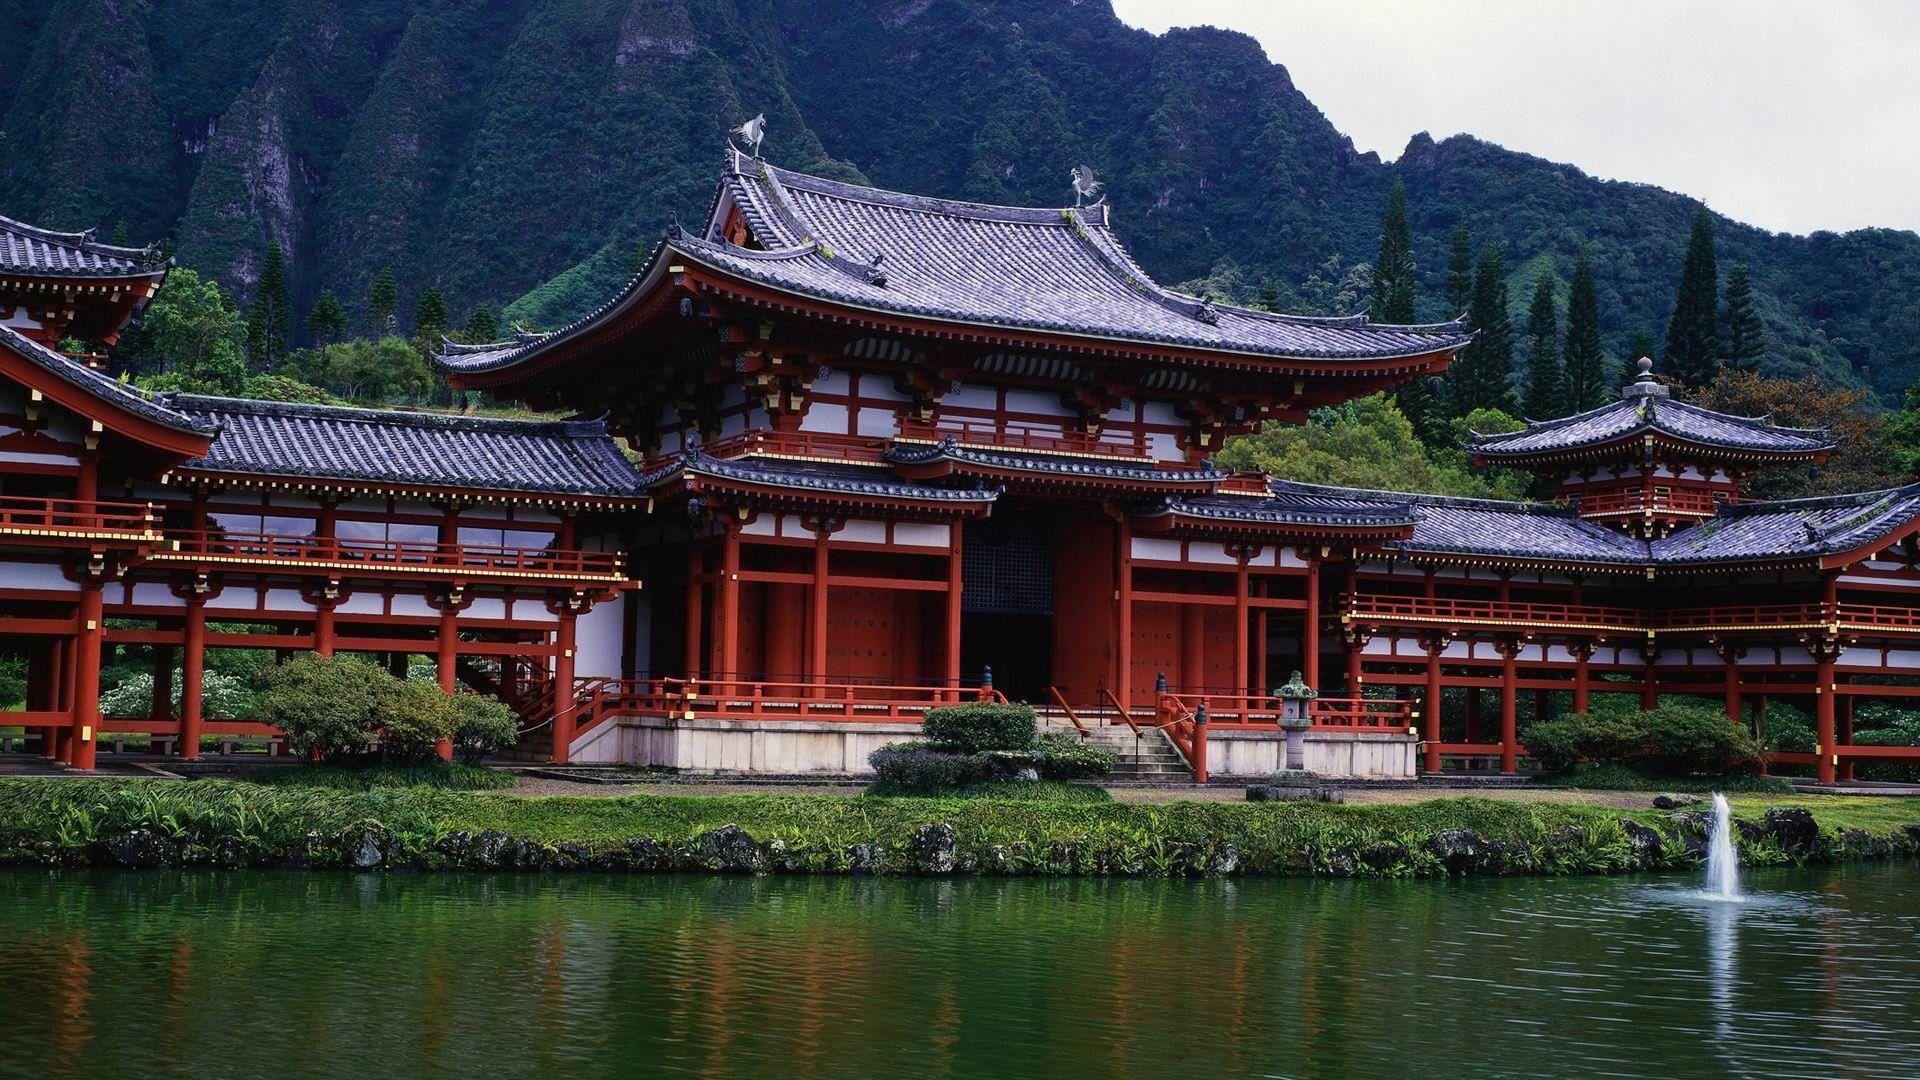 japan architecture wallpaper - photo #9